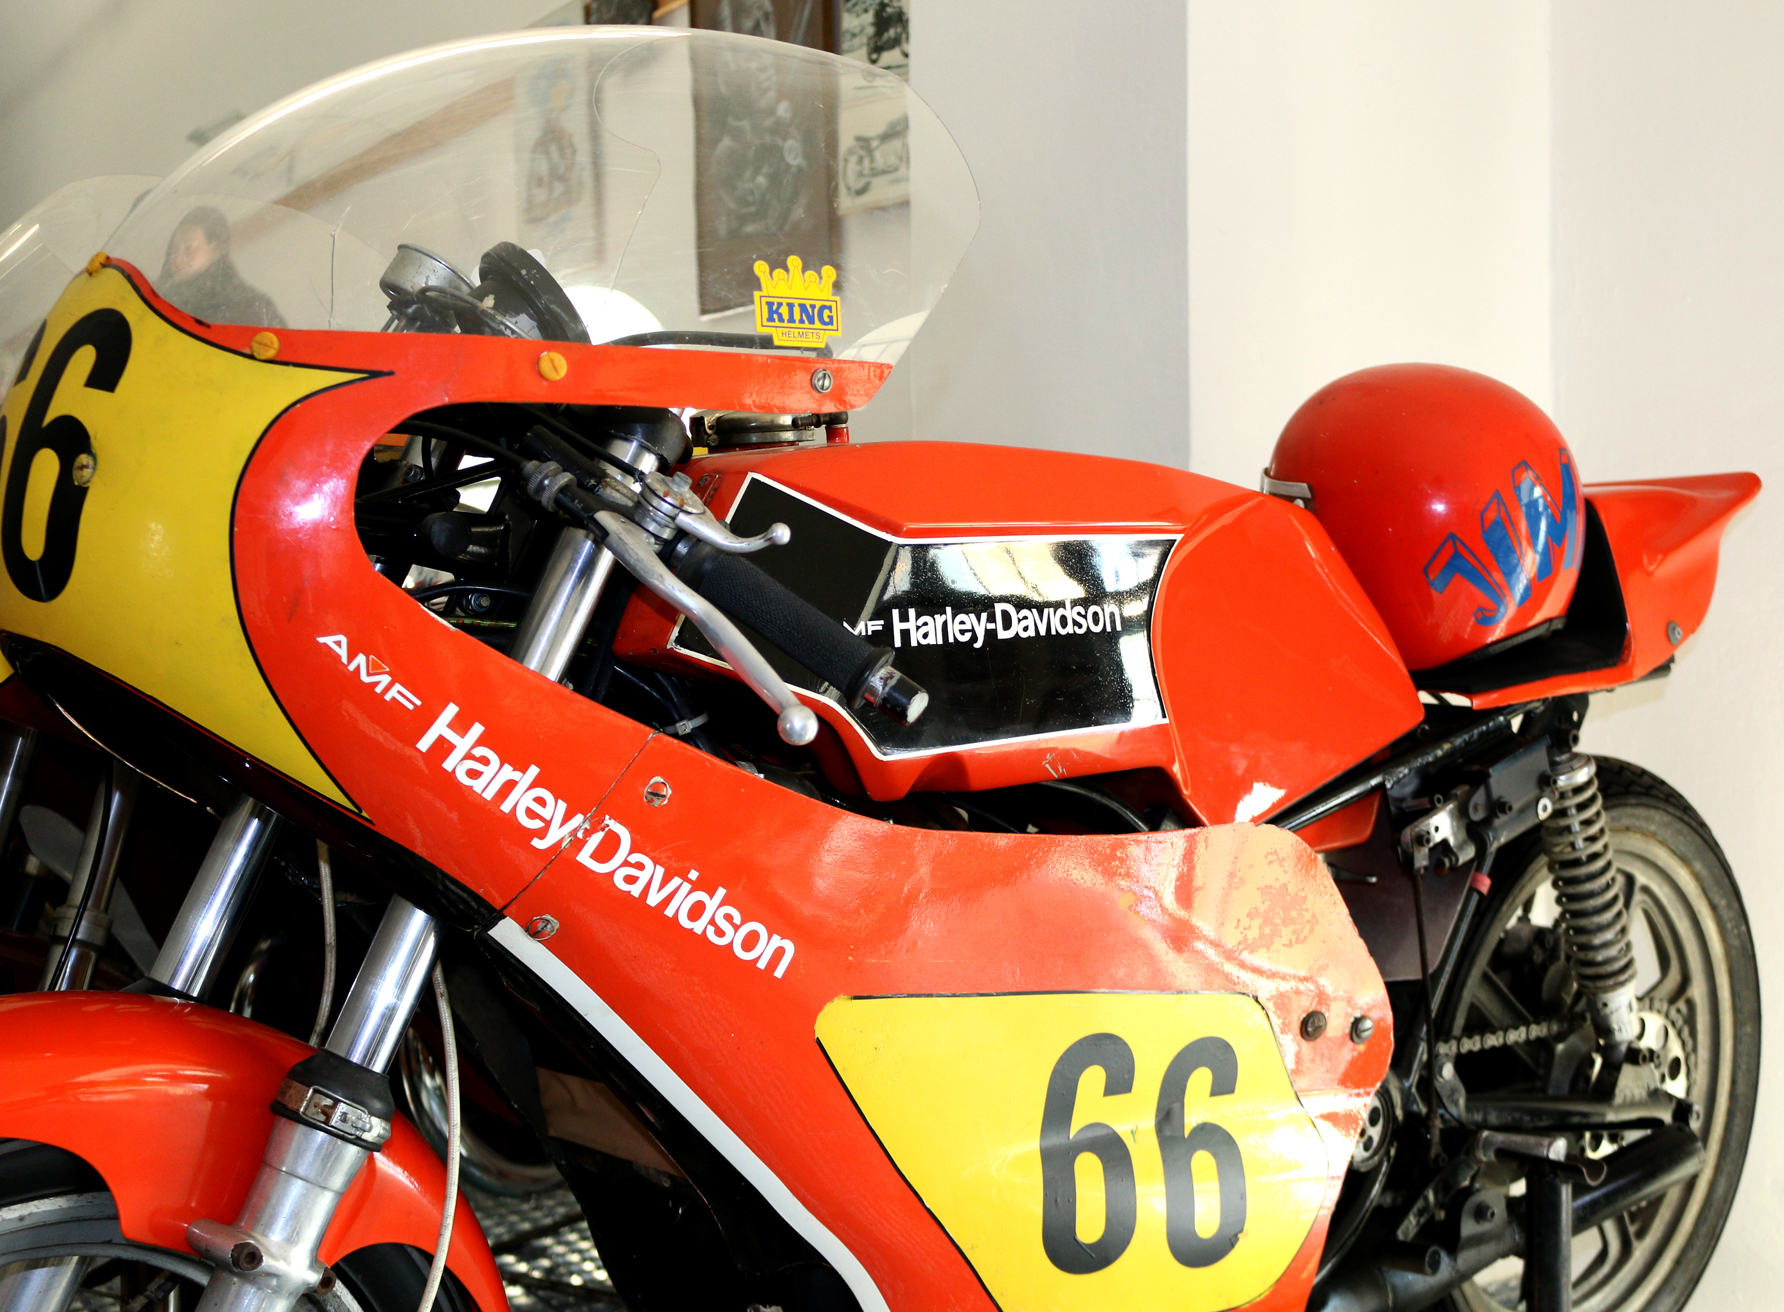 motorradmuseum heinz luthringshauser harley davidson